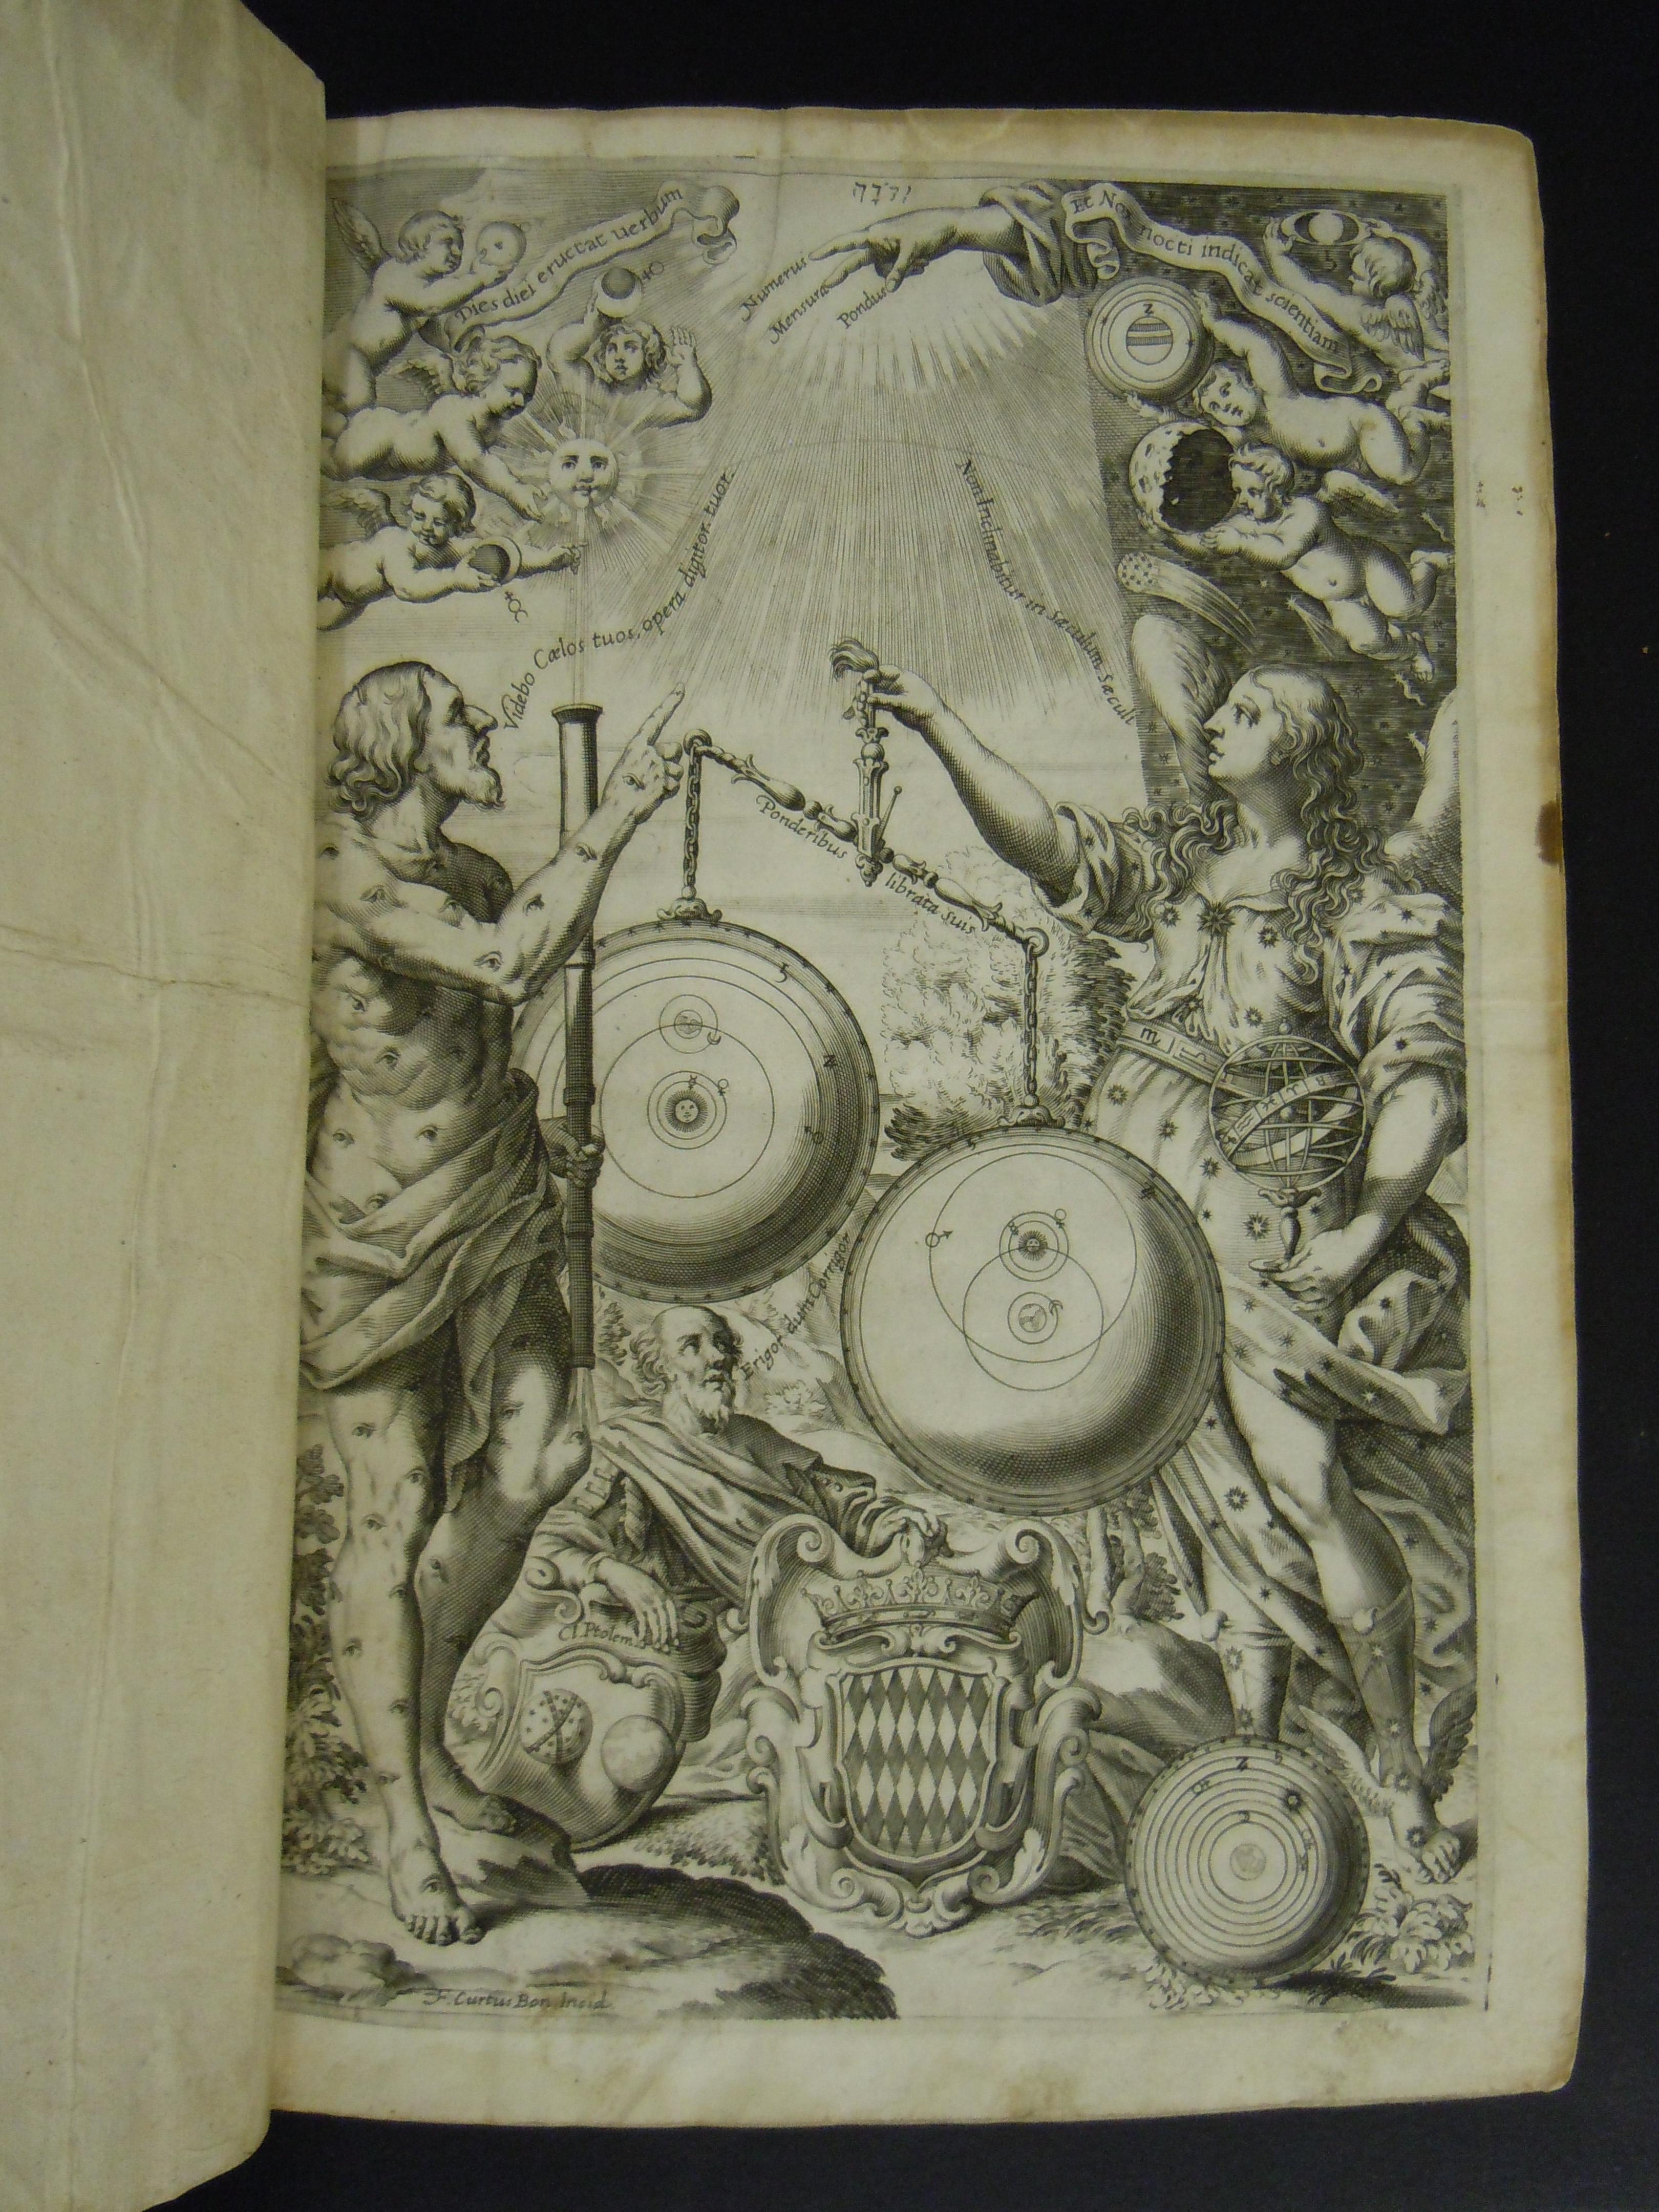 BT3.154.9, 2nd flyleaf, Giovanni Battista Riccioli's Almagestum nouum, 1653,